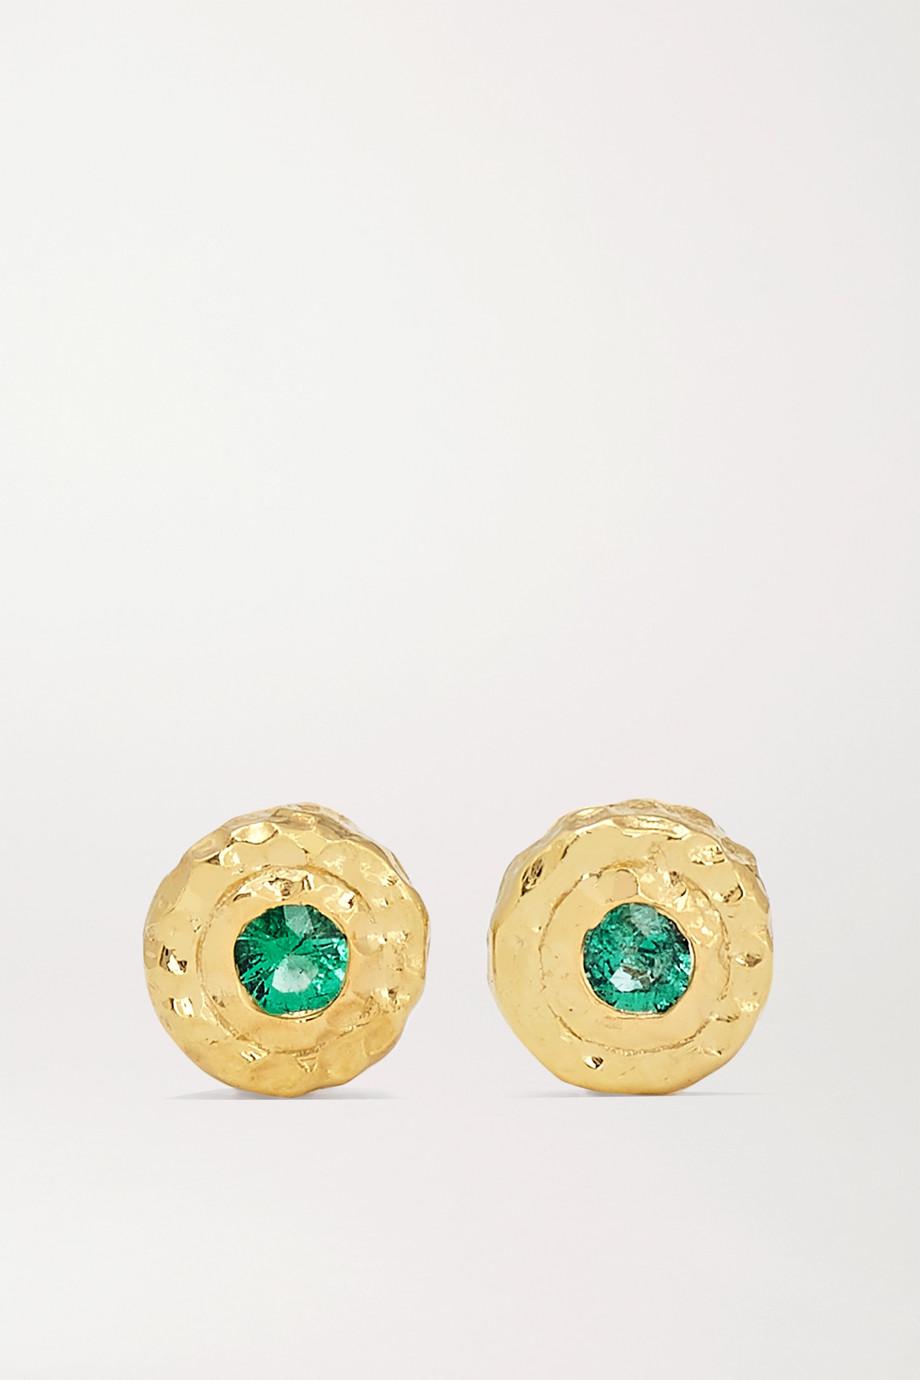 Octavia Elizabeth + NET SUSTAIN Nestling Gem Ohrringe aus recyceltem 18 Karat Gold mit Smaragden